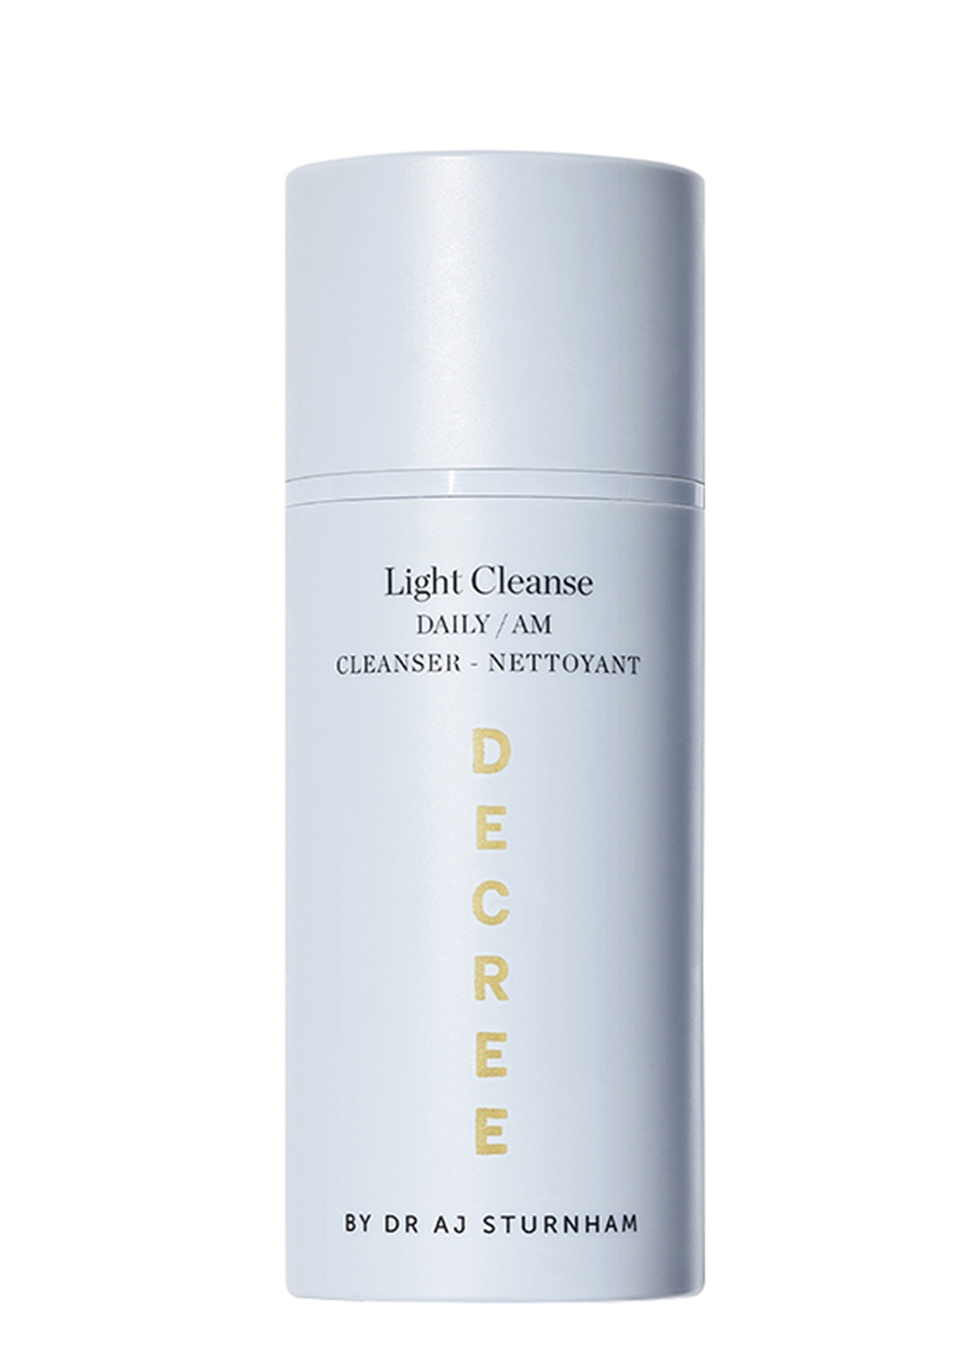 Light Cleanse 100ml